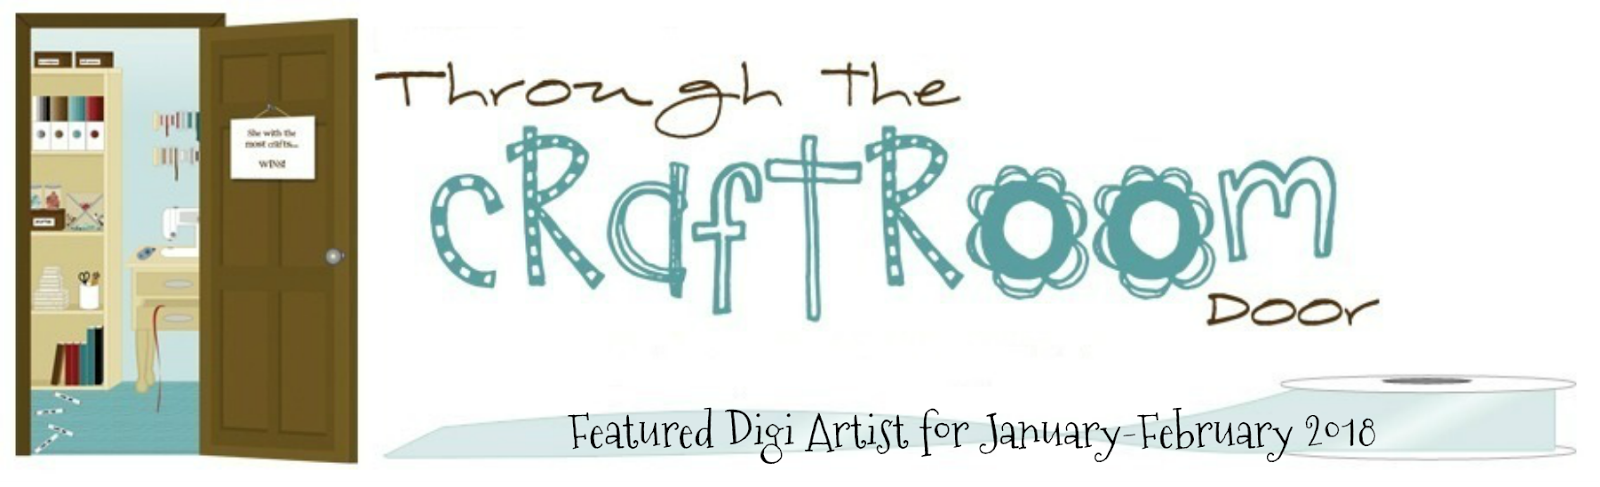 Featured Digi Artist